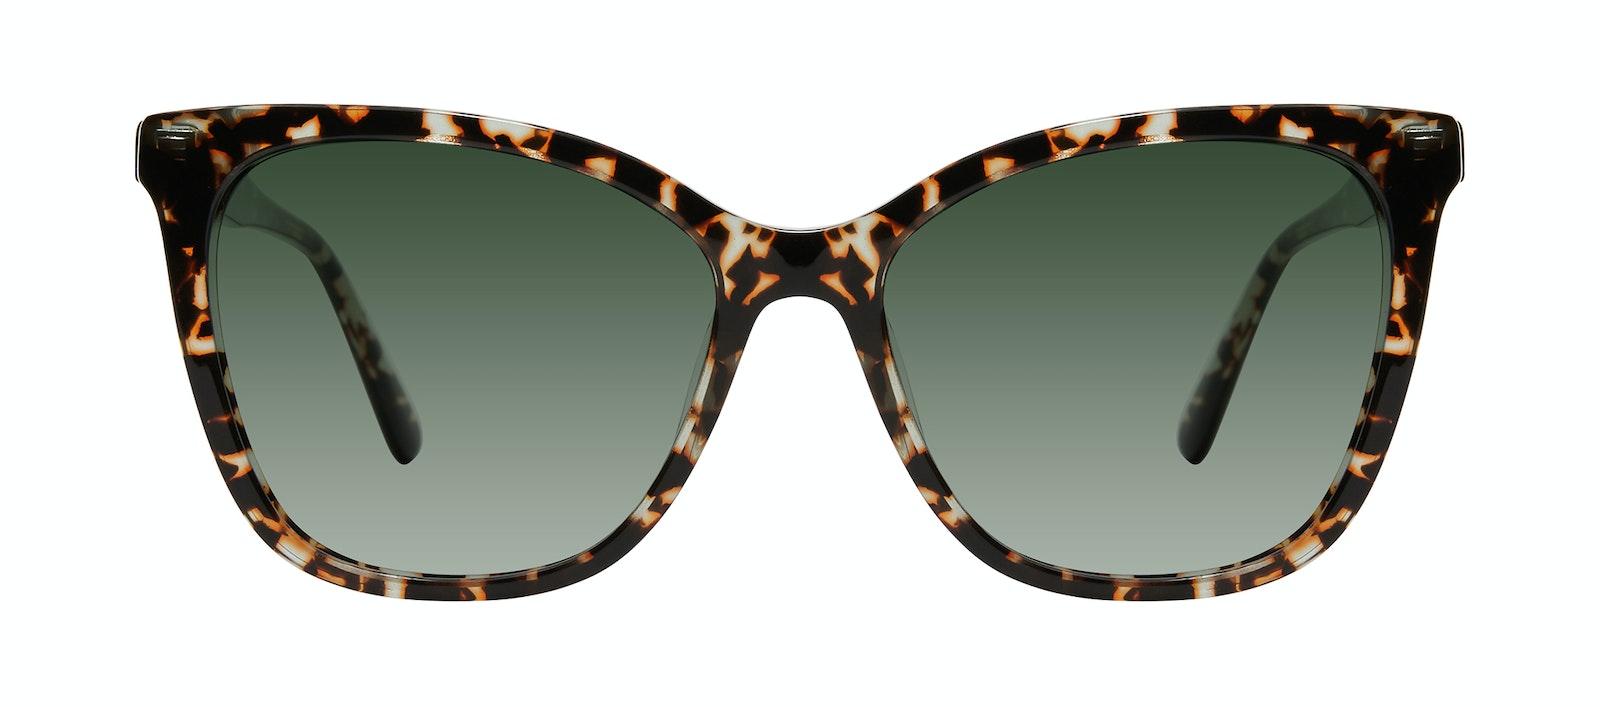 Affordable Fashion Glasses Cat Eye Sunglasses Women Klee M Sunset Tort Front